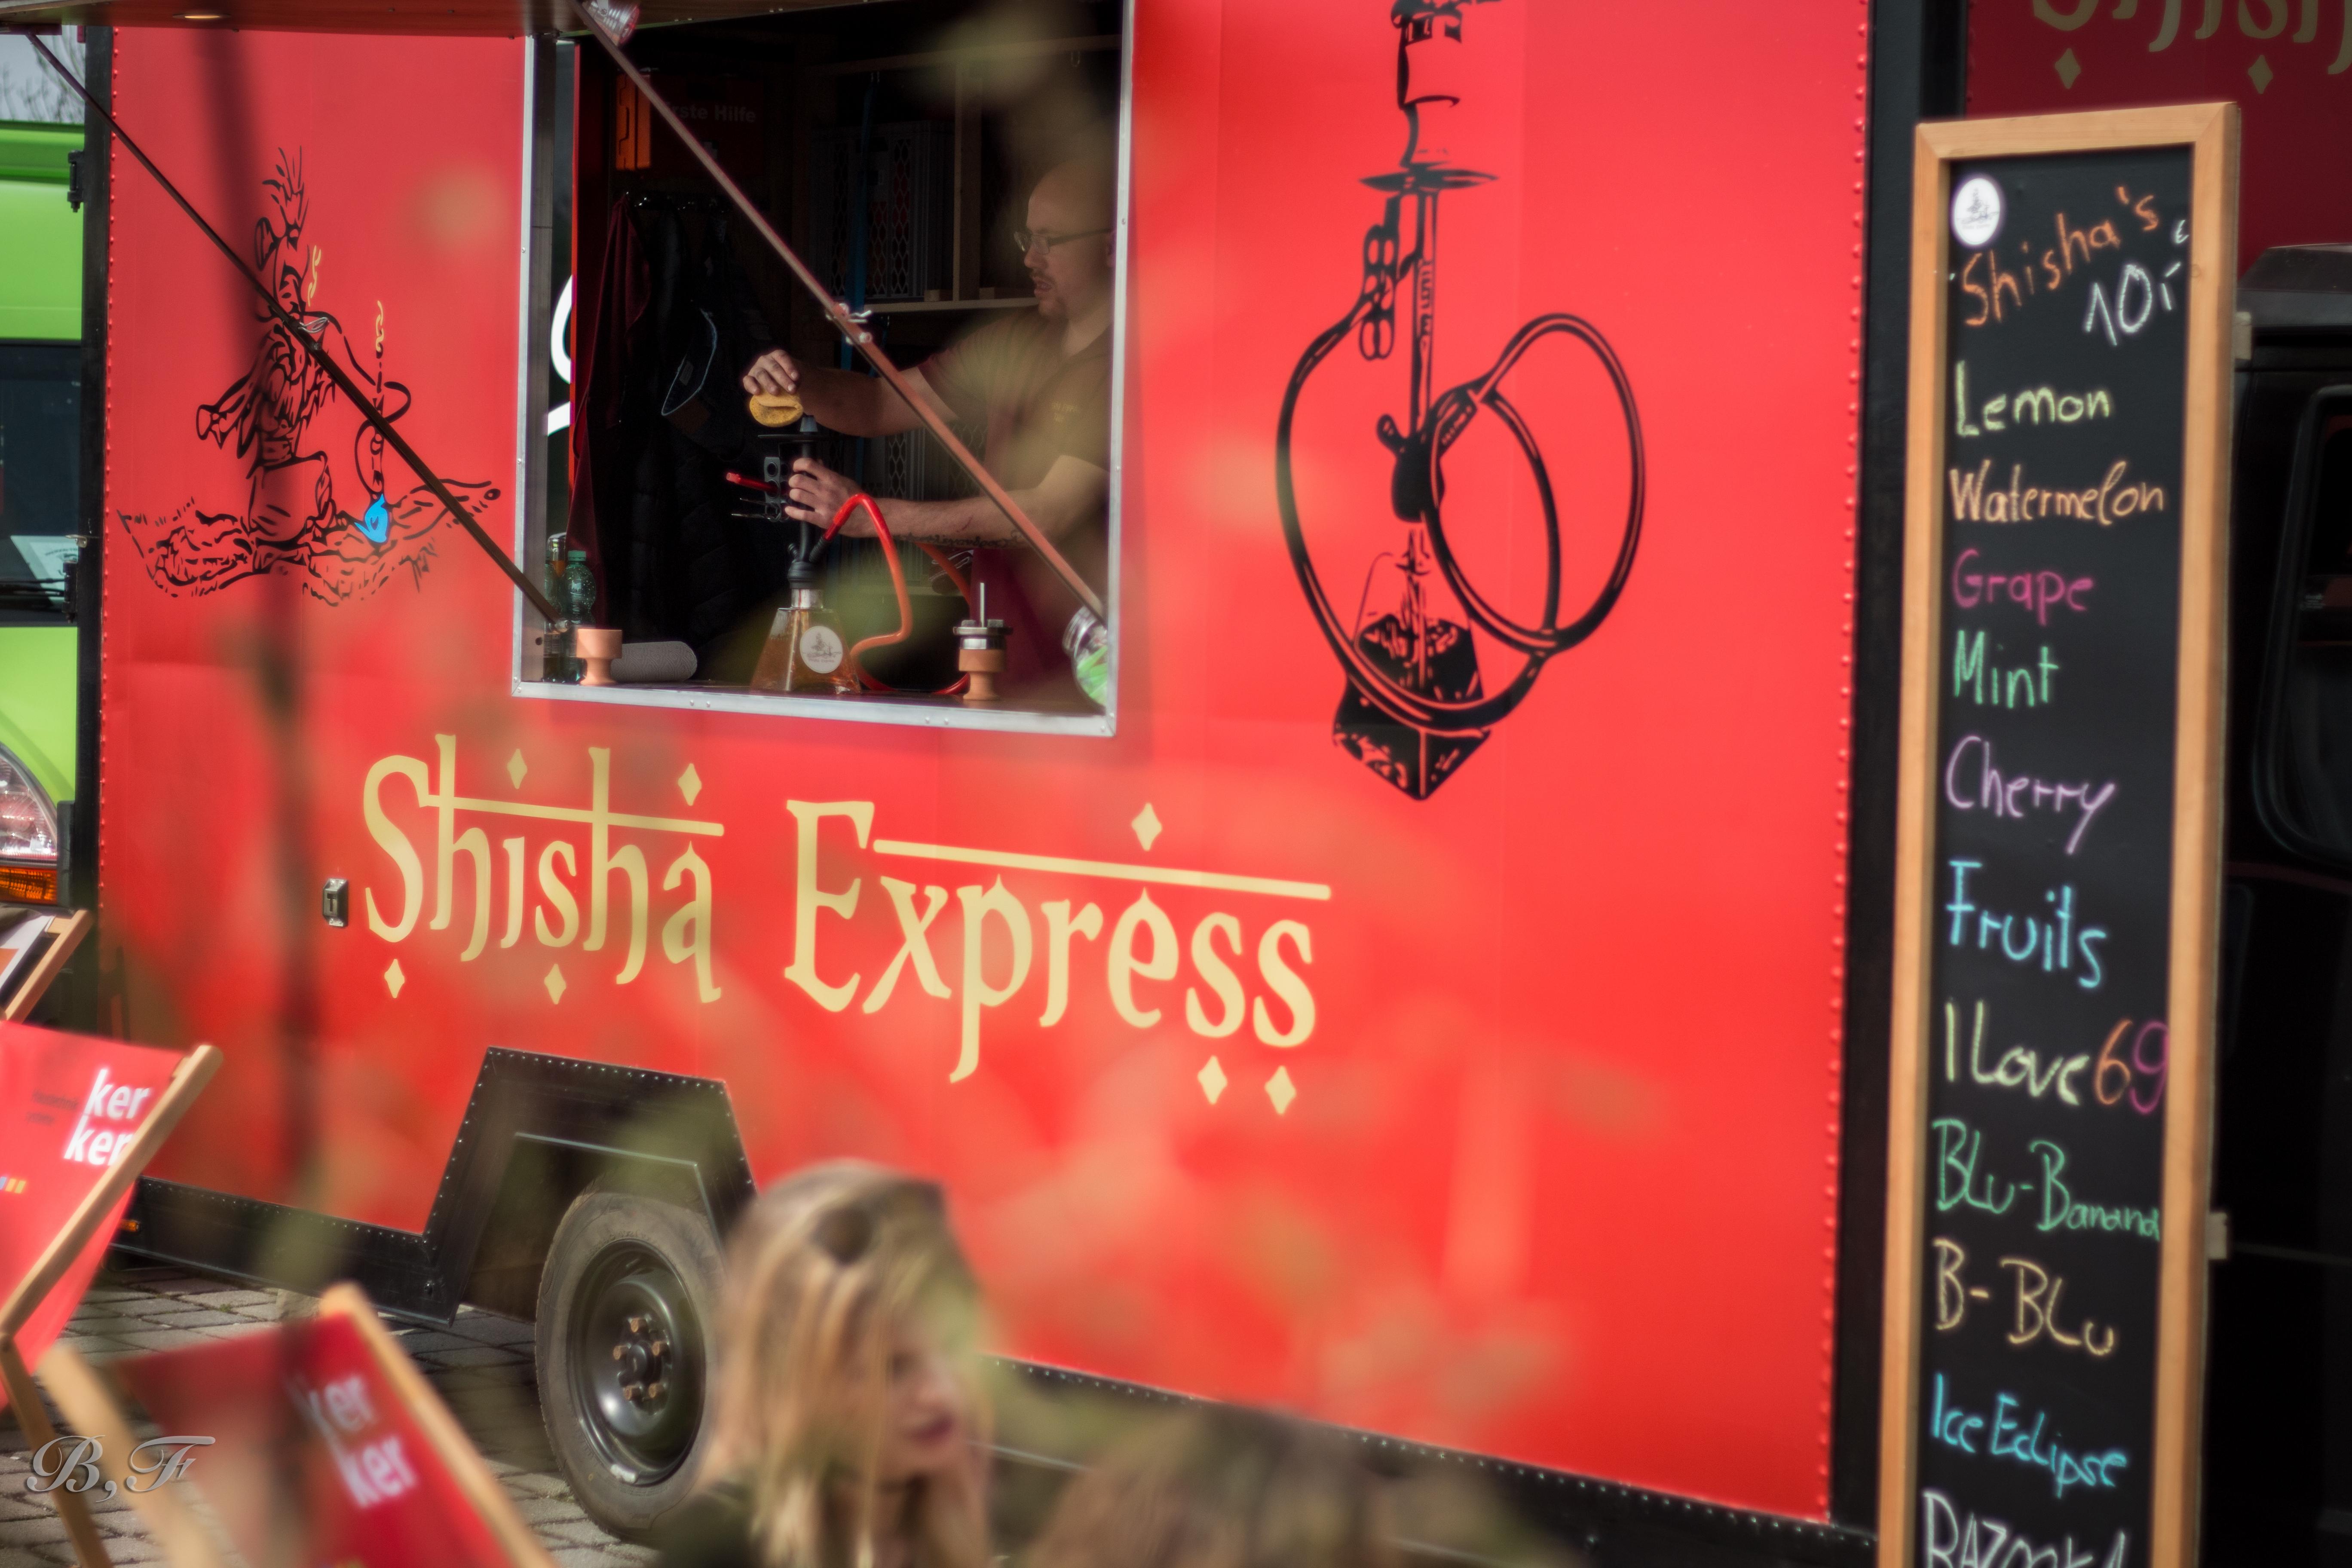 Shisha Express Truck